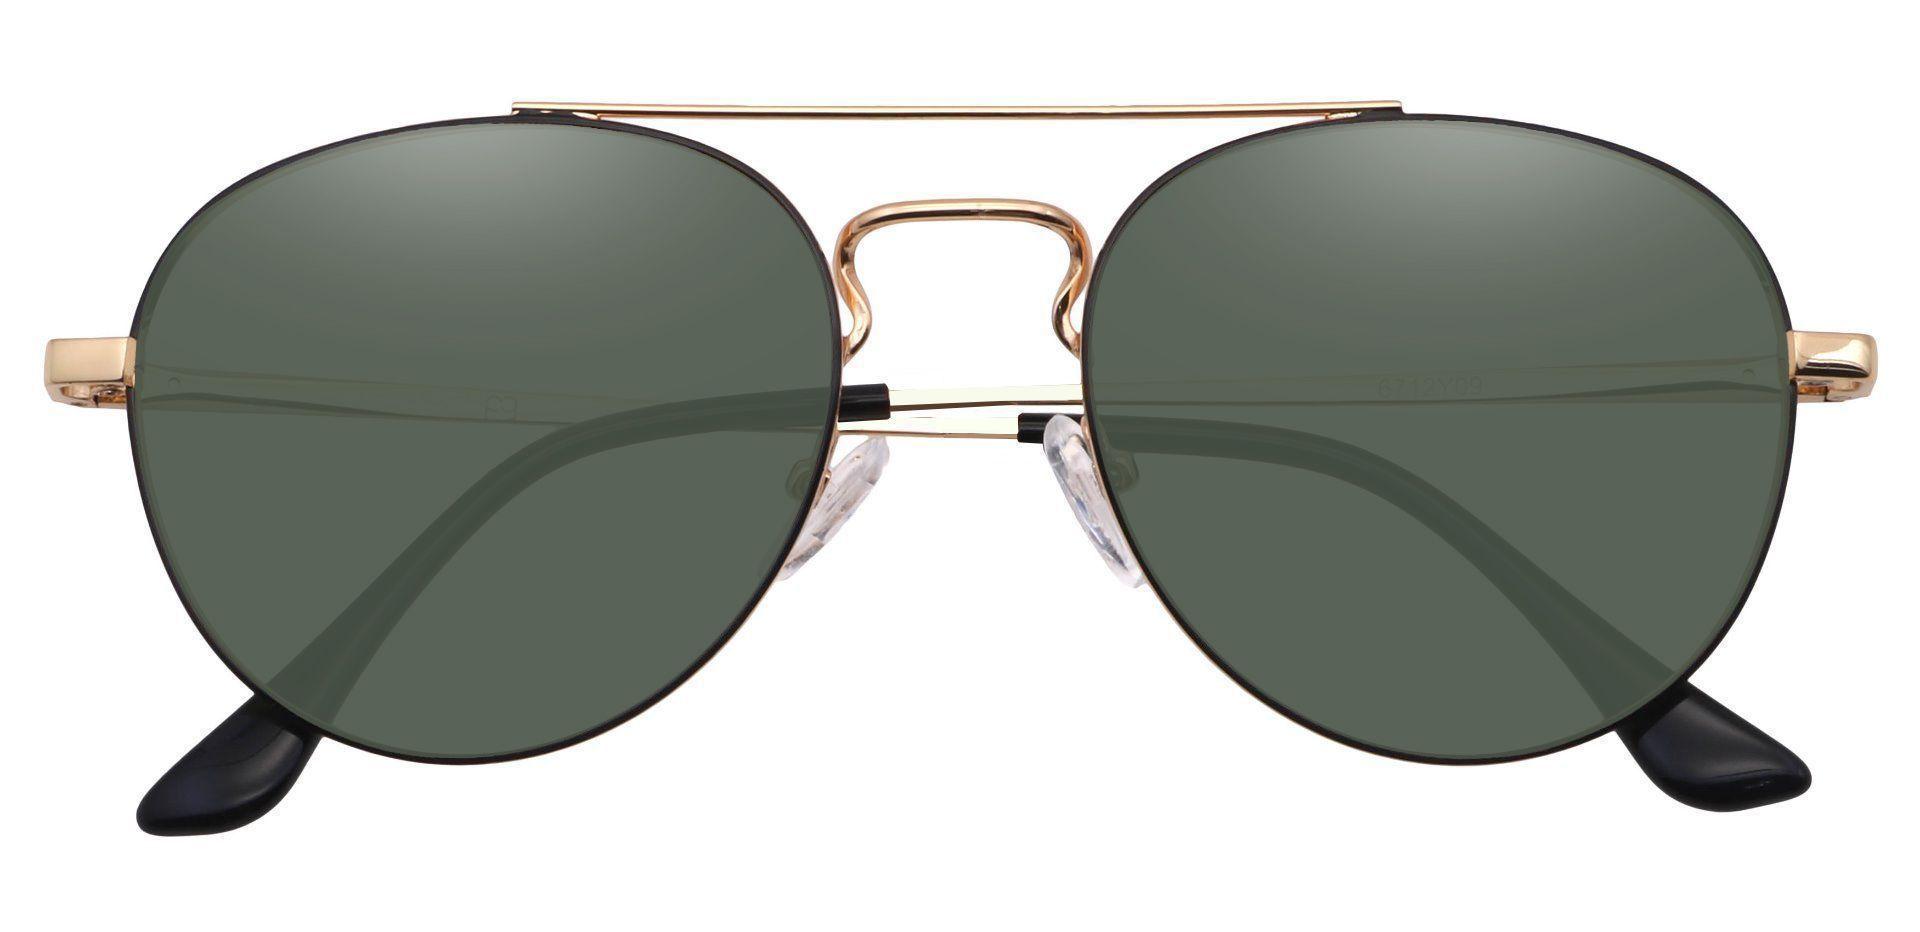 Trapp Aviator Progressive Sunglasses - Gold Frame With Green Lenses